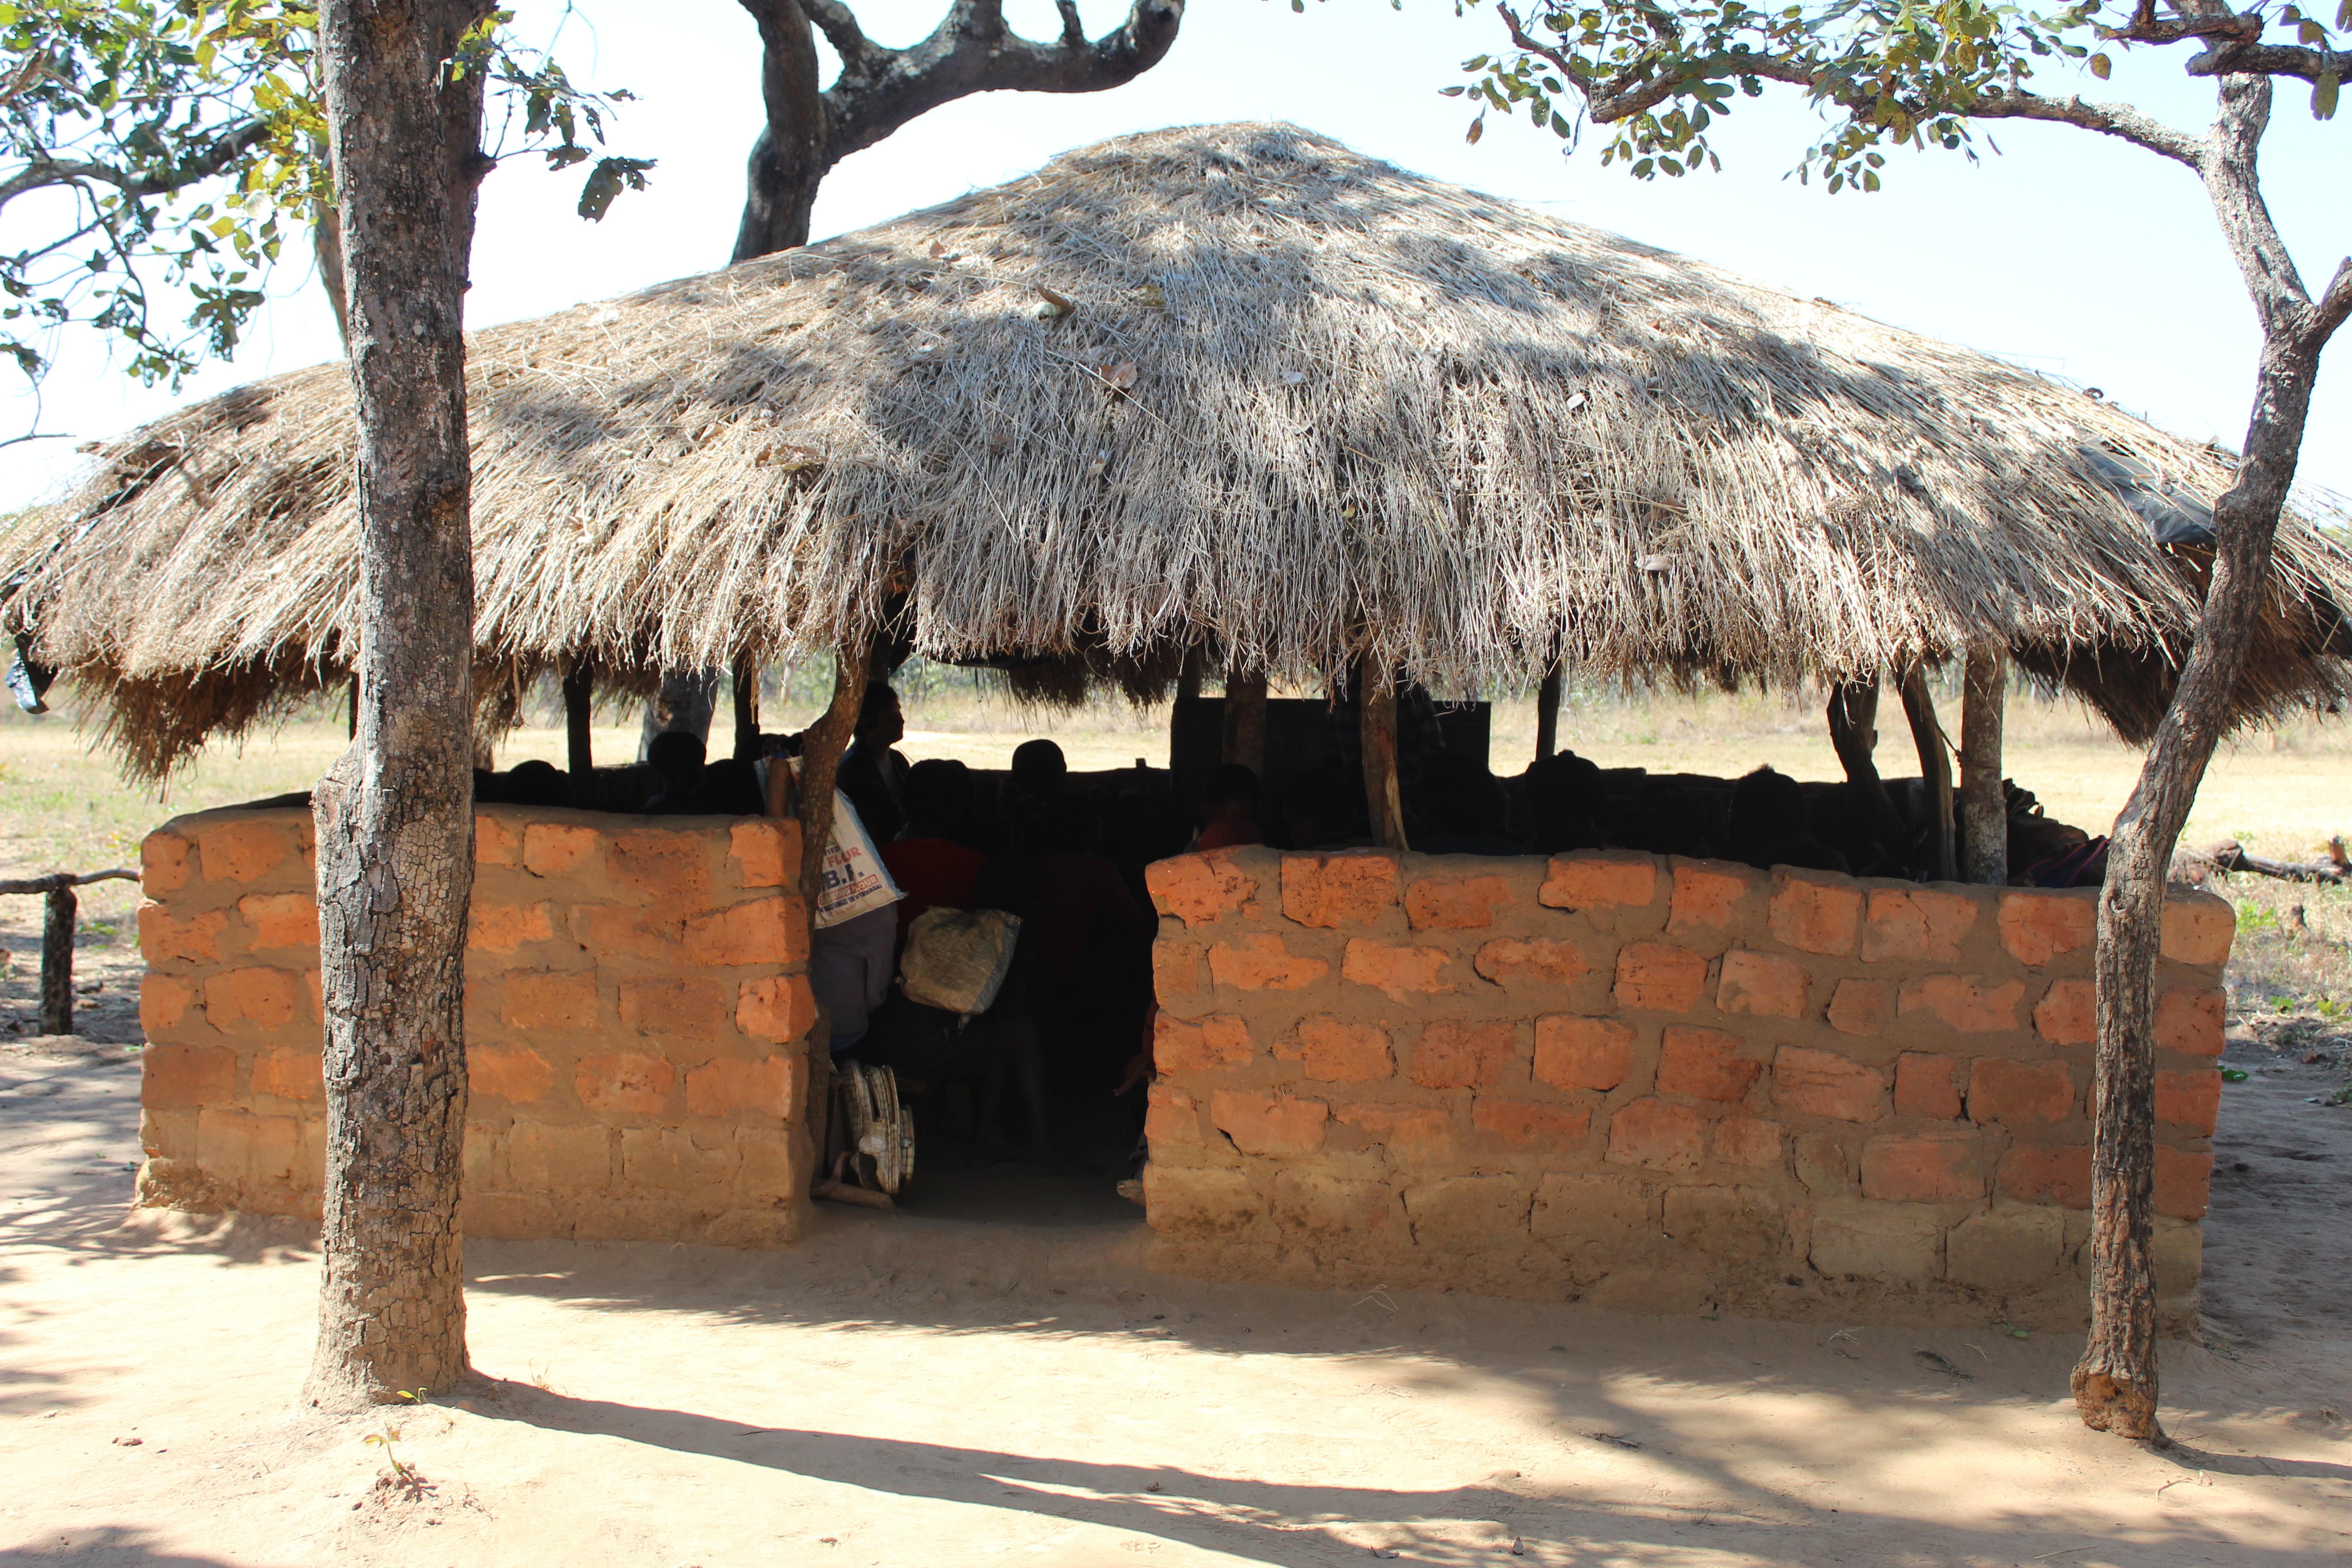 Temporary classrooms